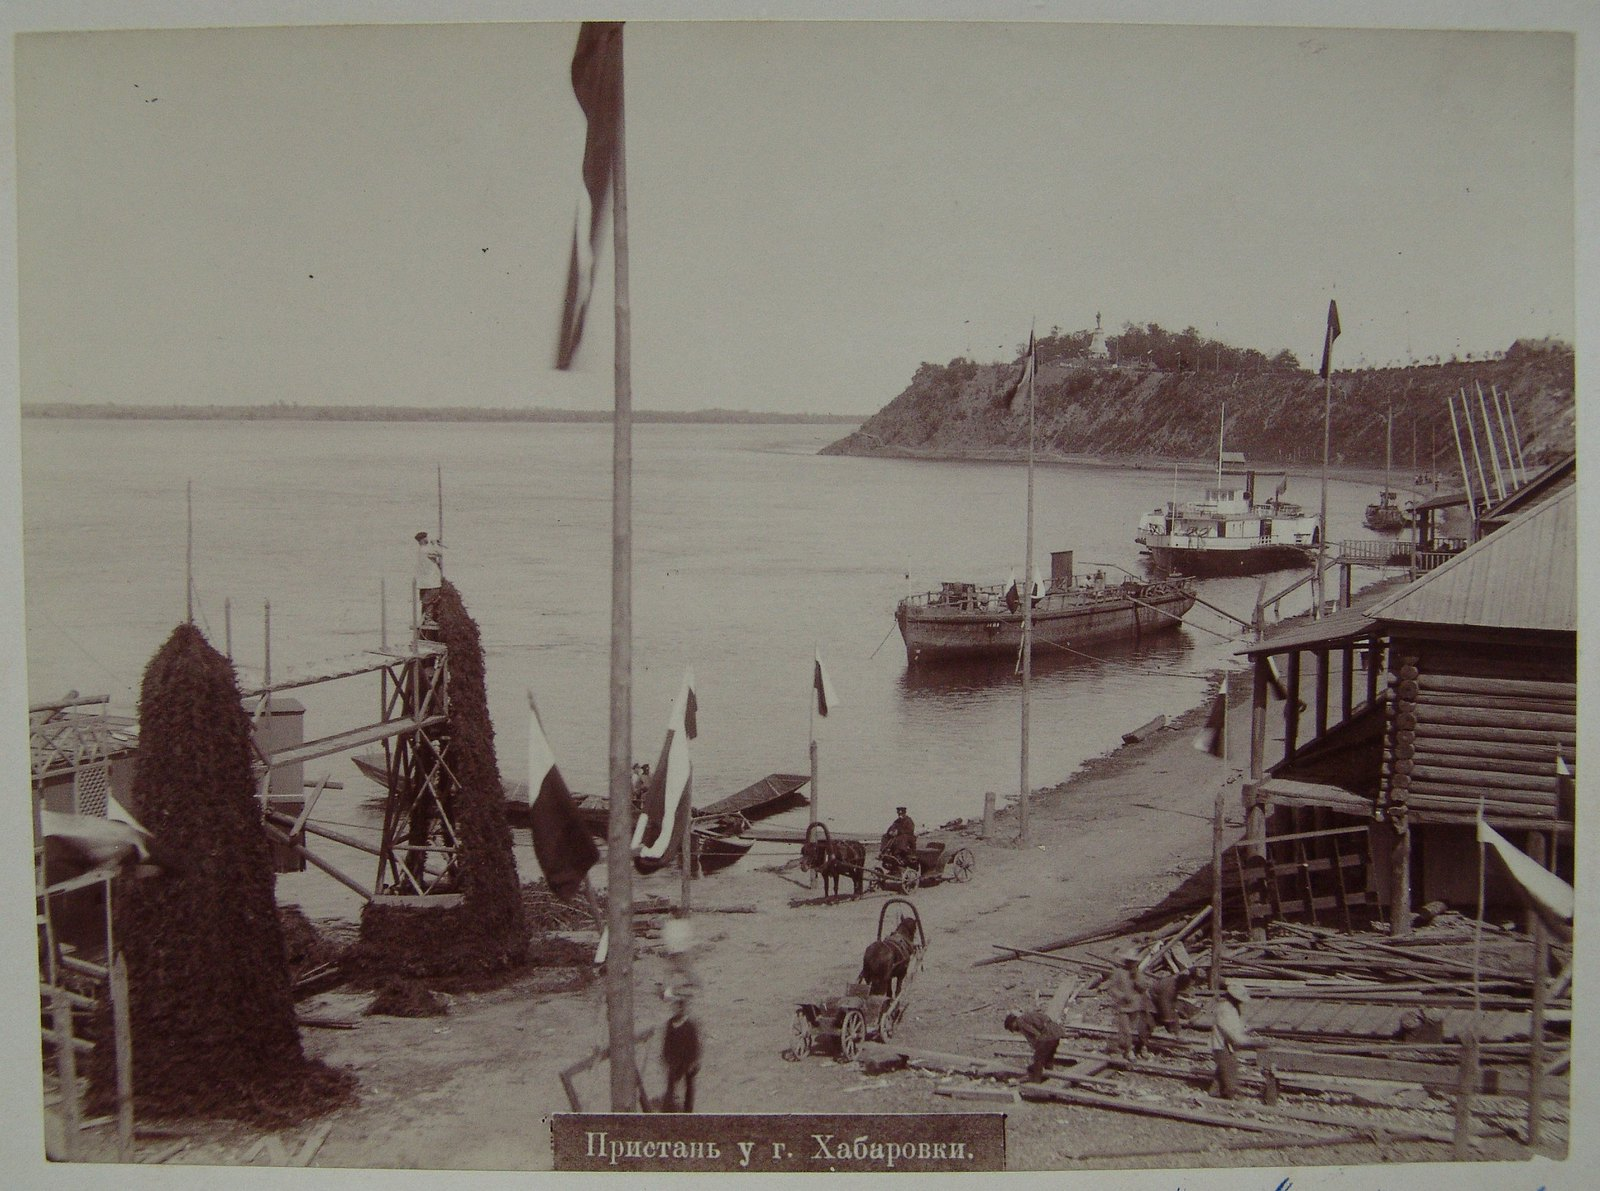 02. 1891. Пристань у города Хабаровки.